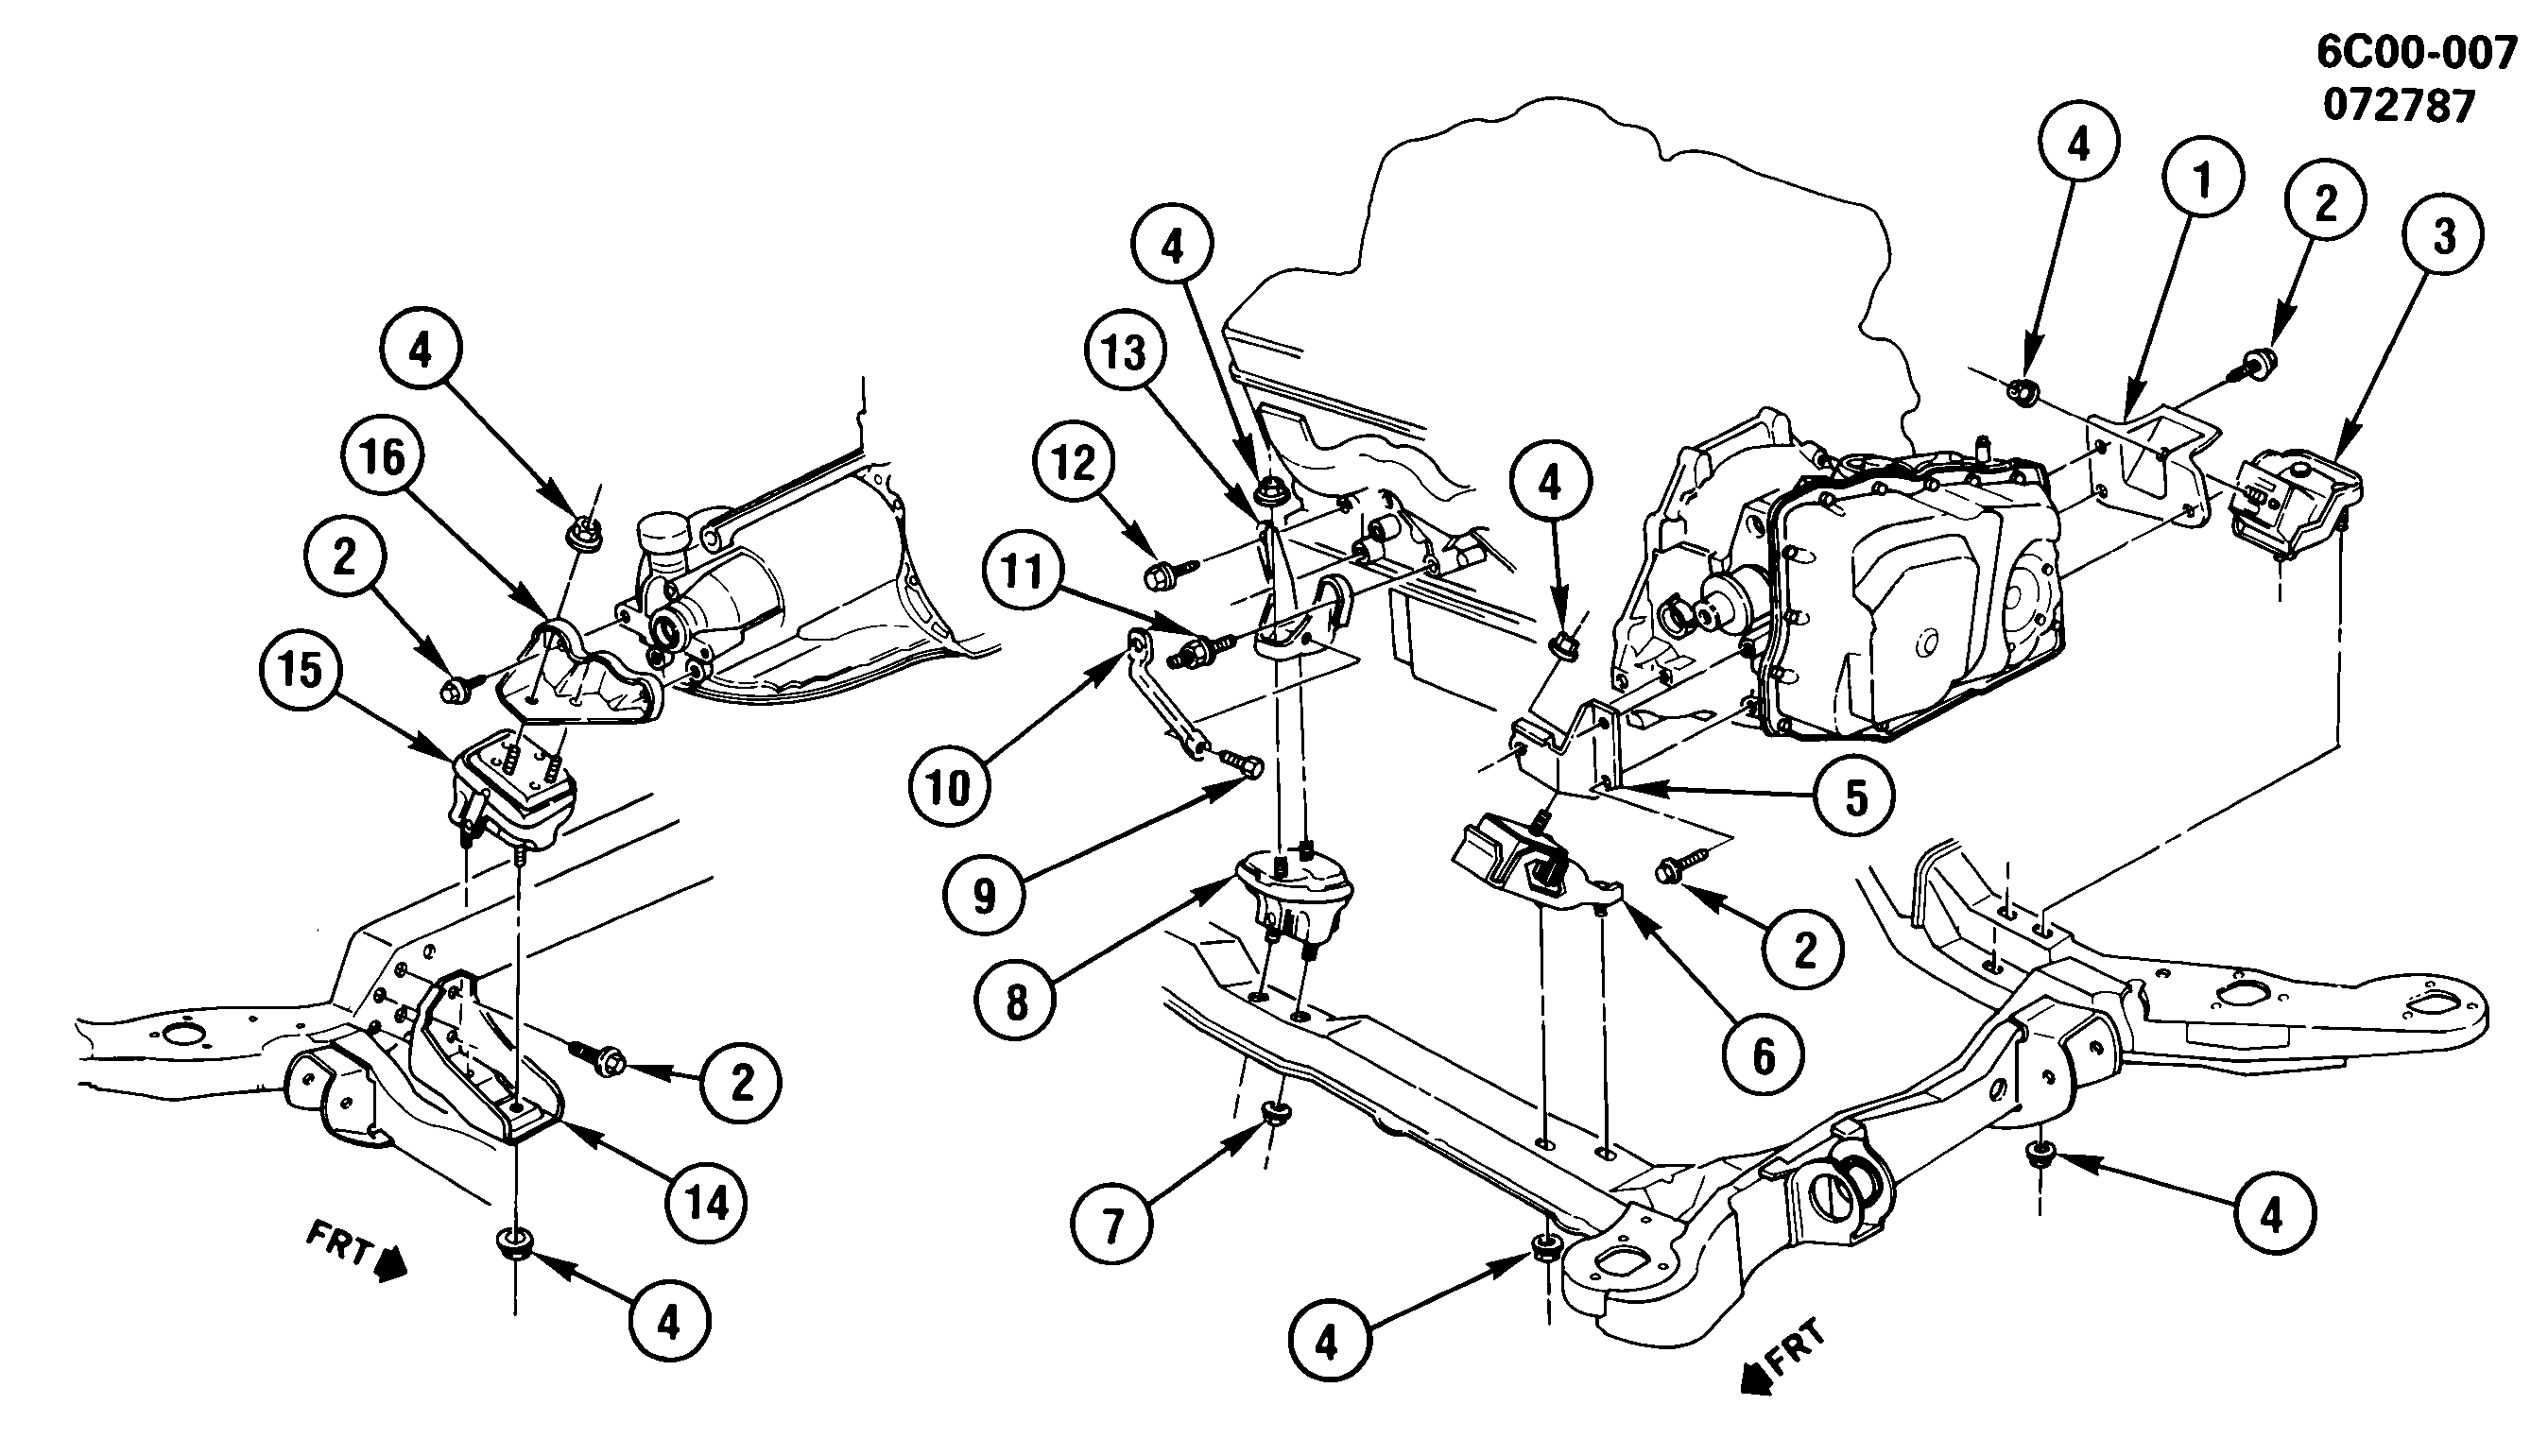 Cadillac Deville - C ENGINE & TRANSMISSION MOUNTING-V8 4.5L (LR6/4.5-5) >  EPC Online > Nemiga.comParts catalogs